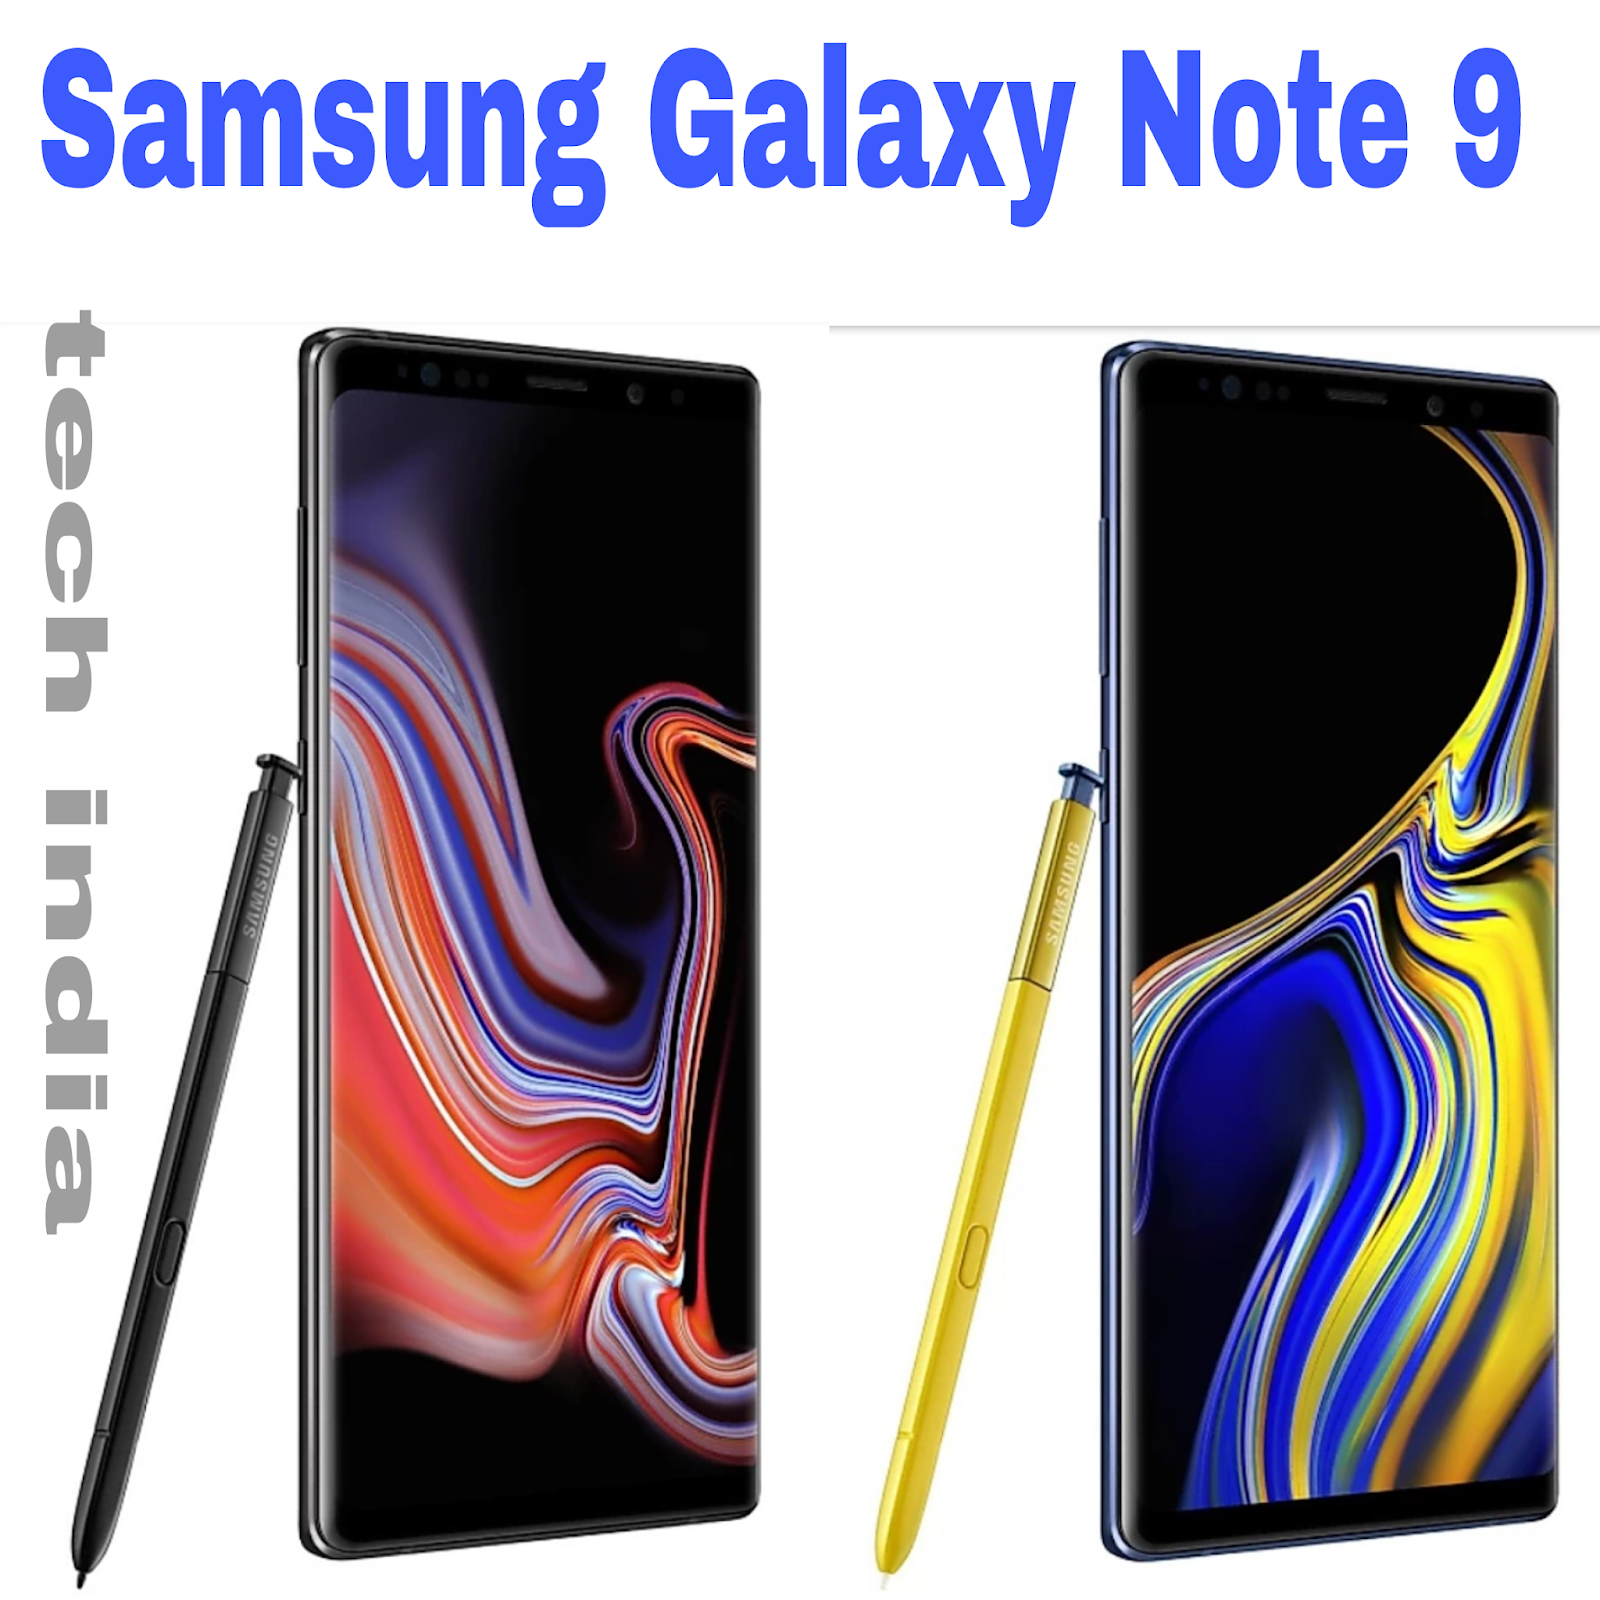 samsung galaxy note 9 price in india samsung galaxy note 9 gsmarena samsung galaxy